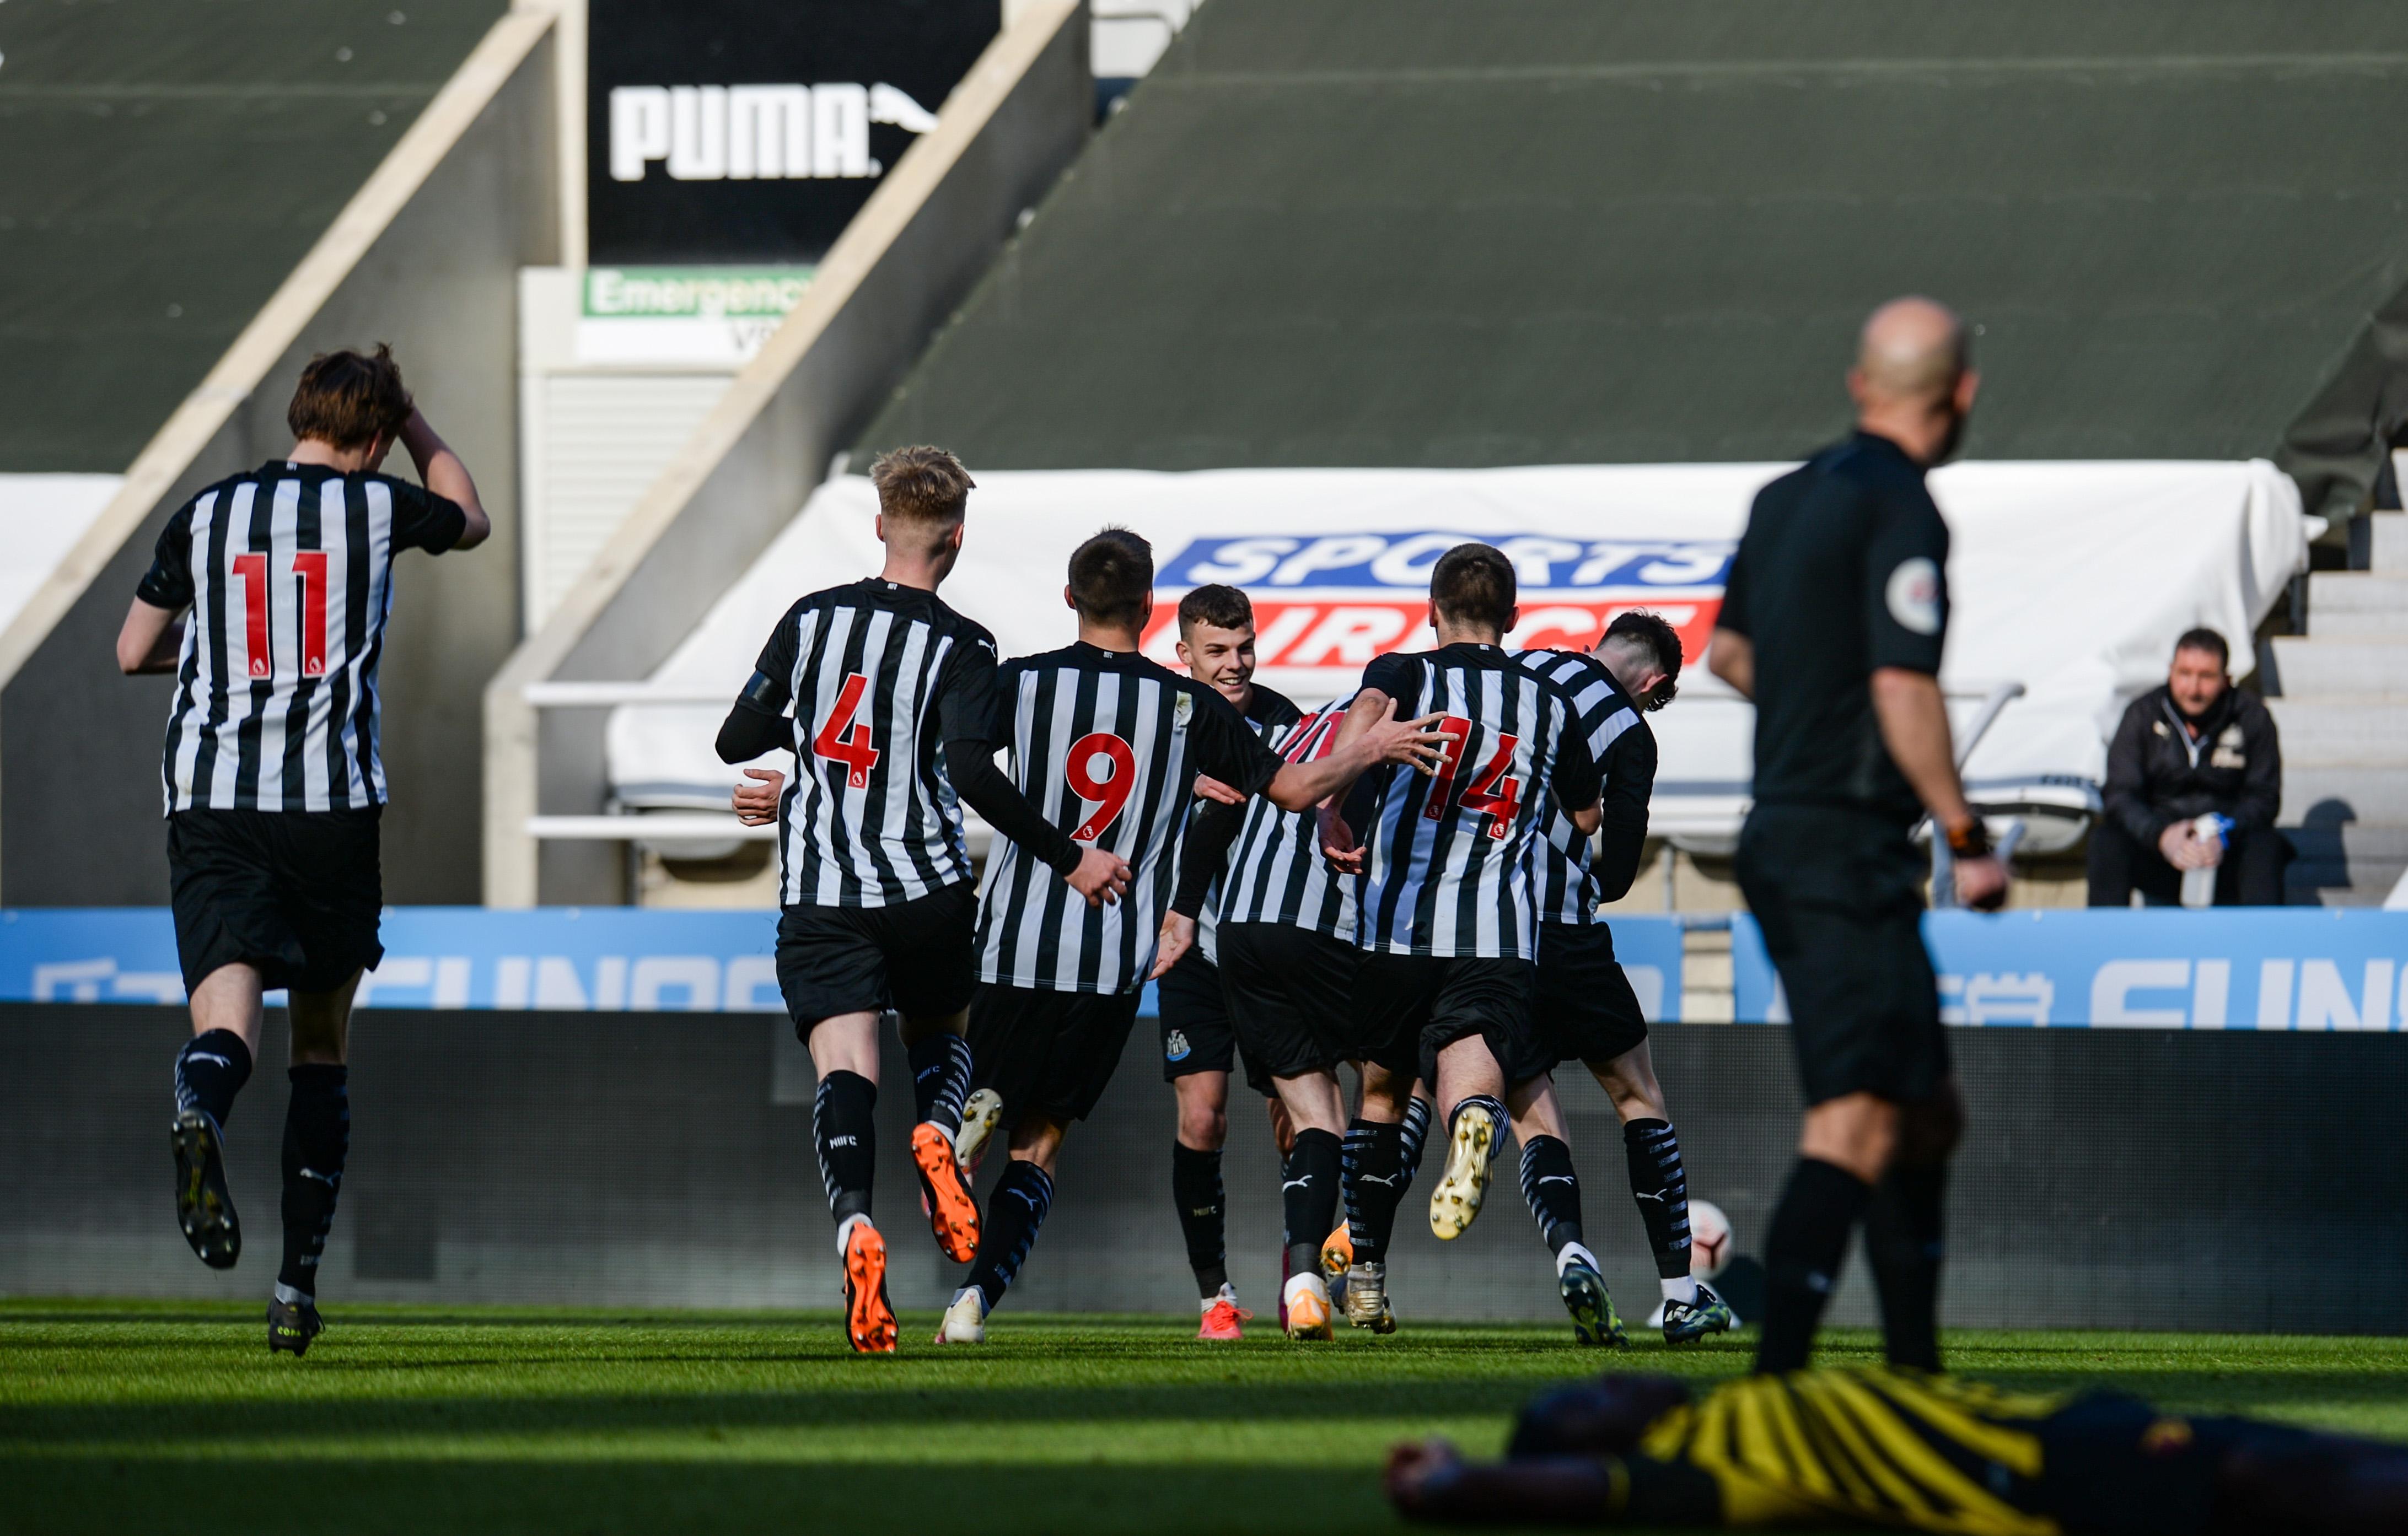 Newcastle United U18 v Watford U18: FA Youth Cup Newcastle Celebrations